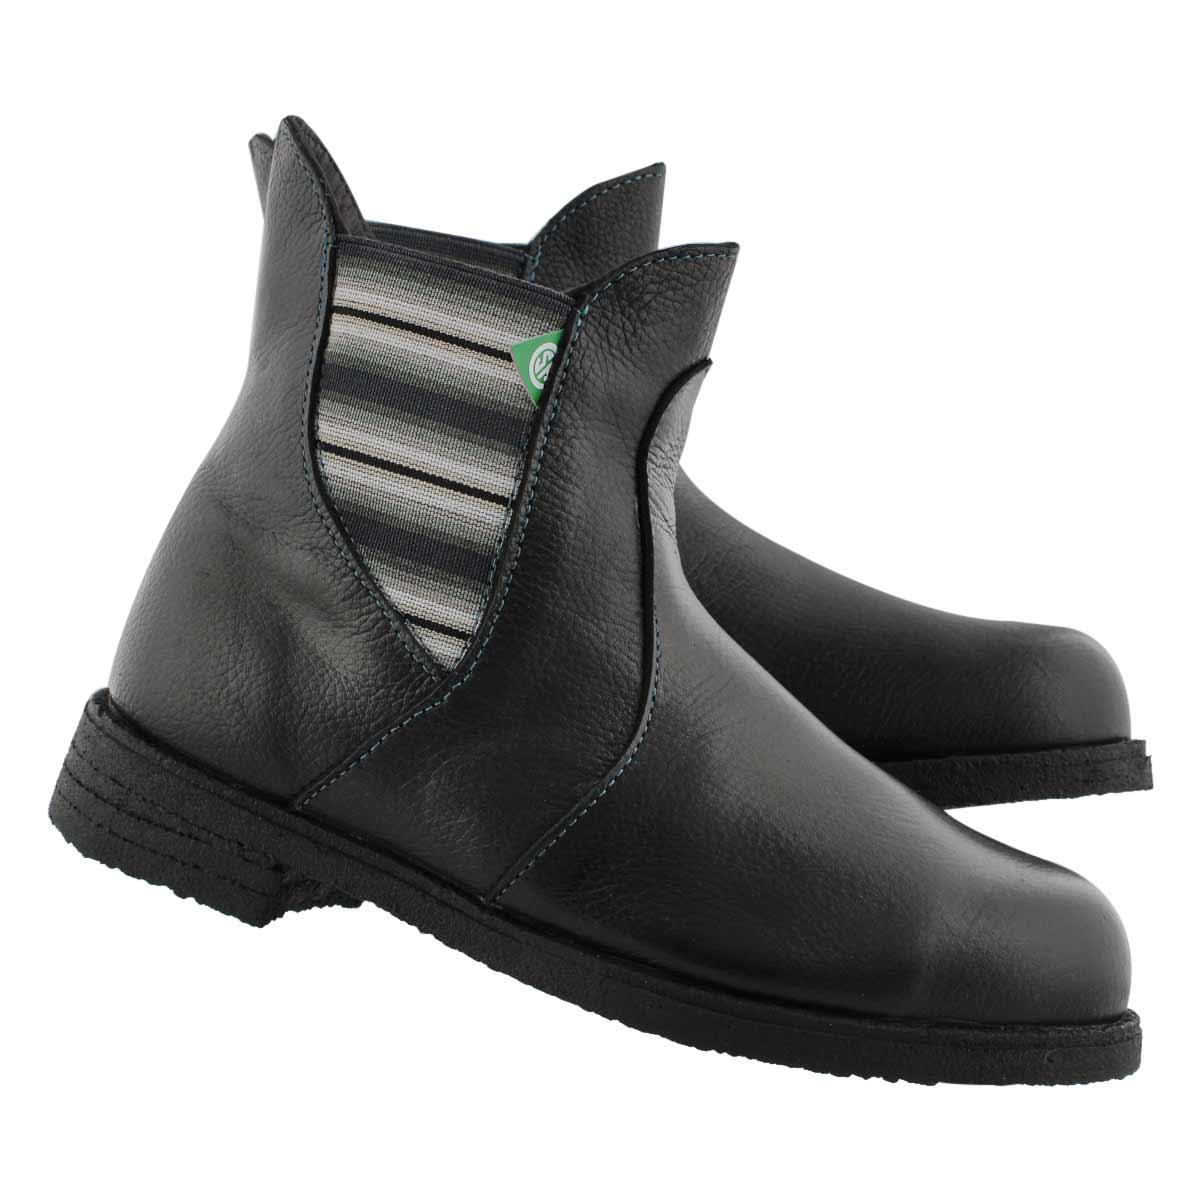 Lds Bunny II black CSA slip on boot